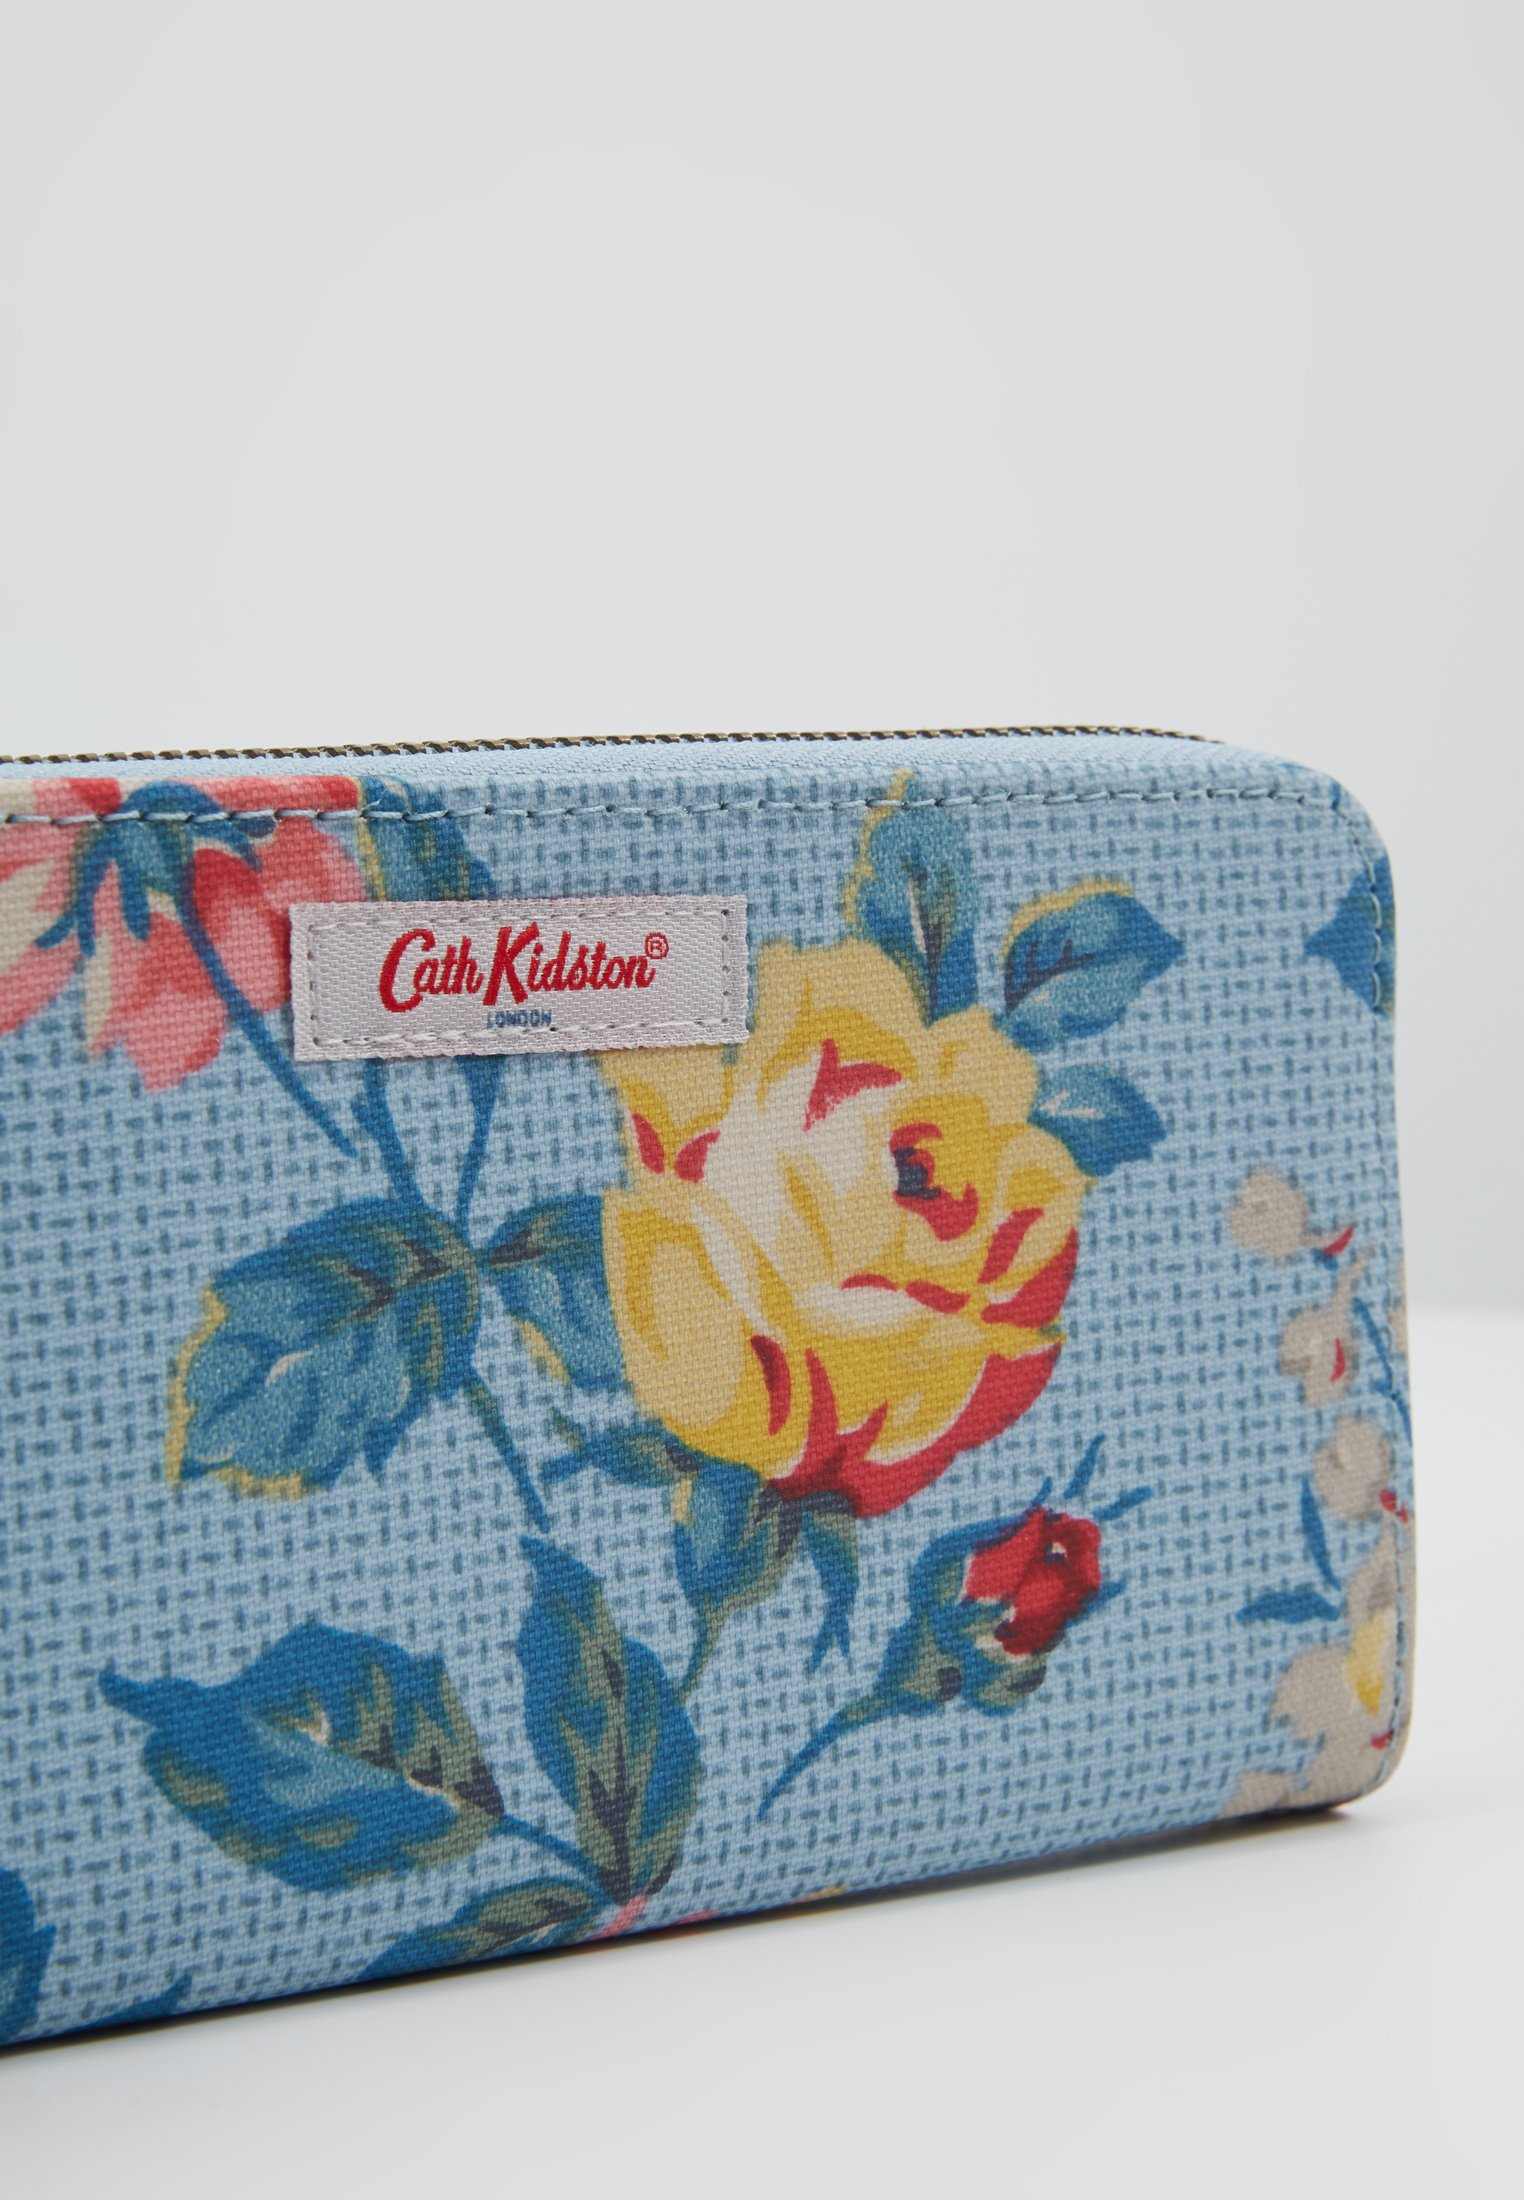 WalletPortefeuille Continental Zip Chalk Cath Blue Kidston 0wmNOv8ny